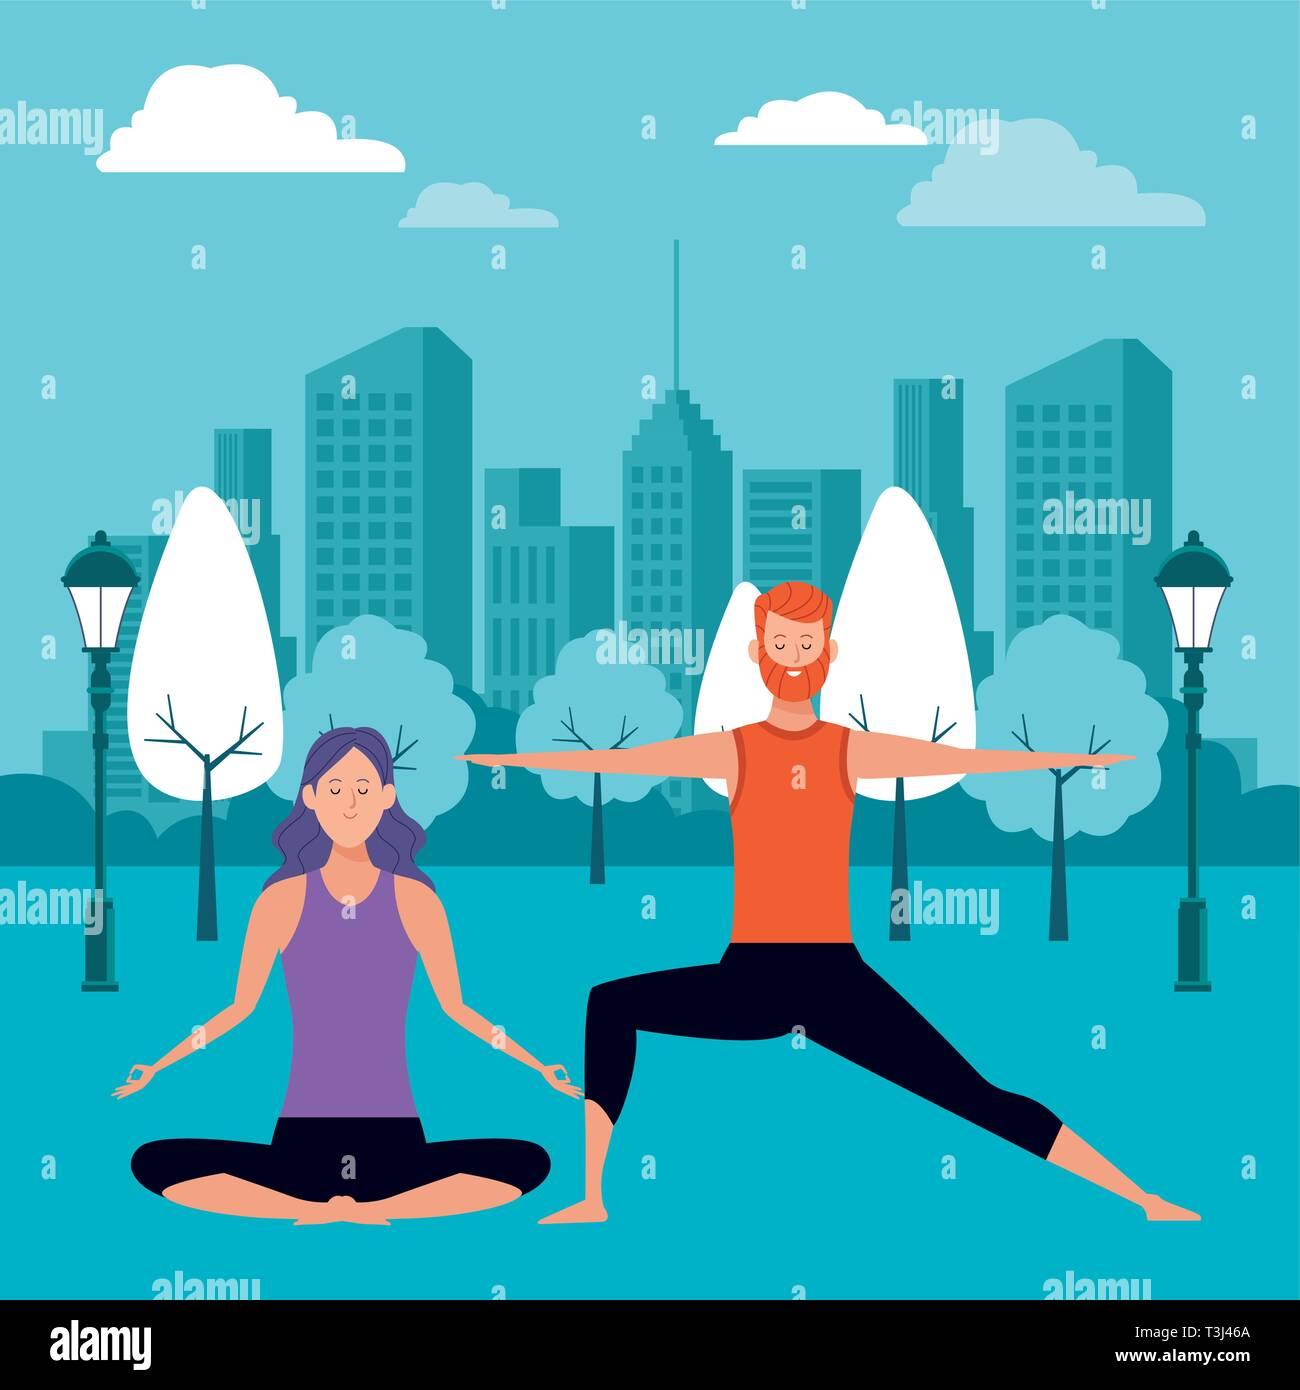 couple yoga poses Stock Vector Image & Art - Alamy